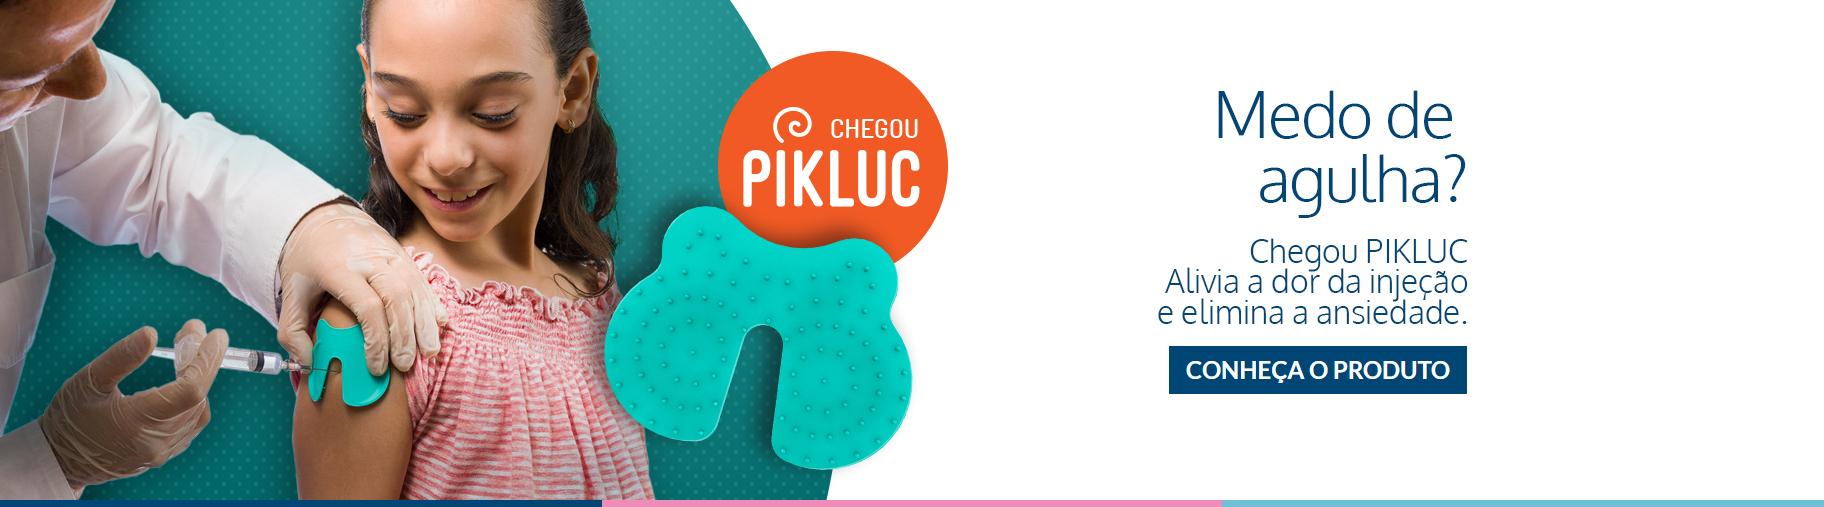 Banner Pikluc